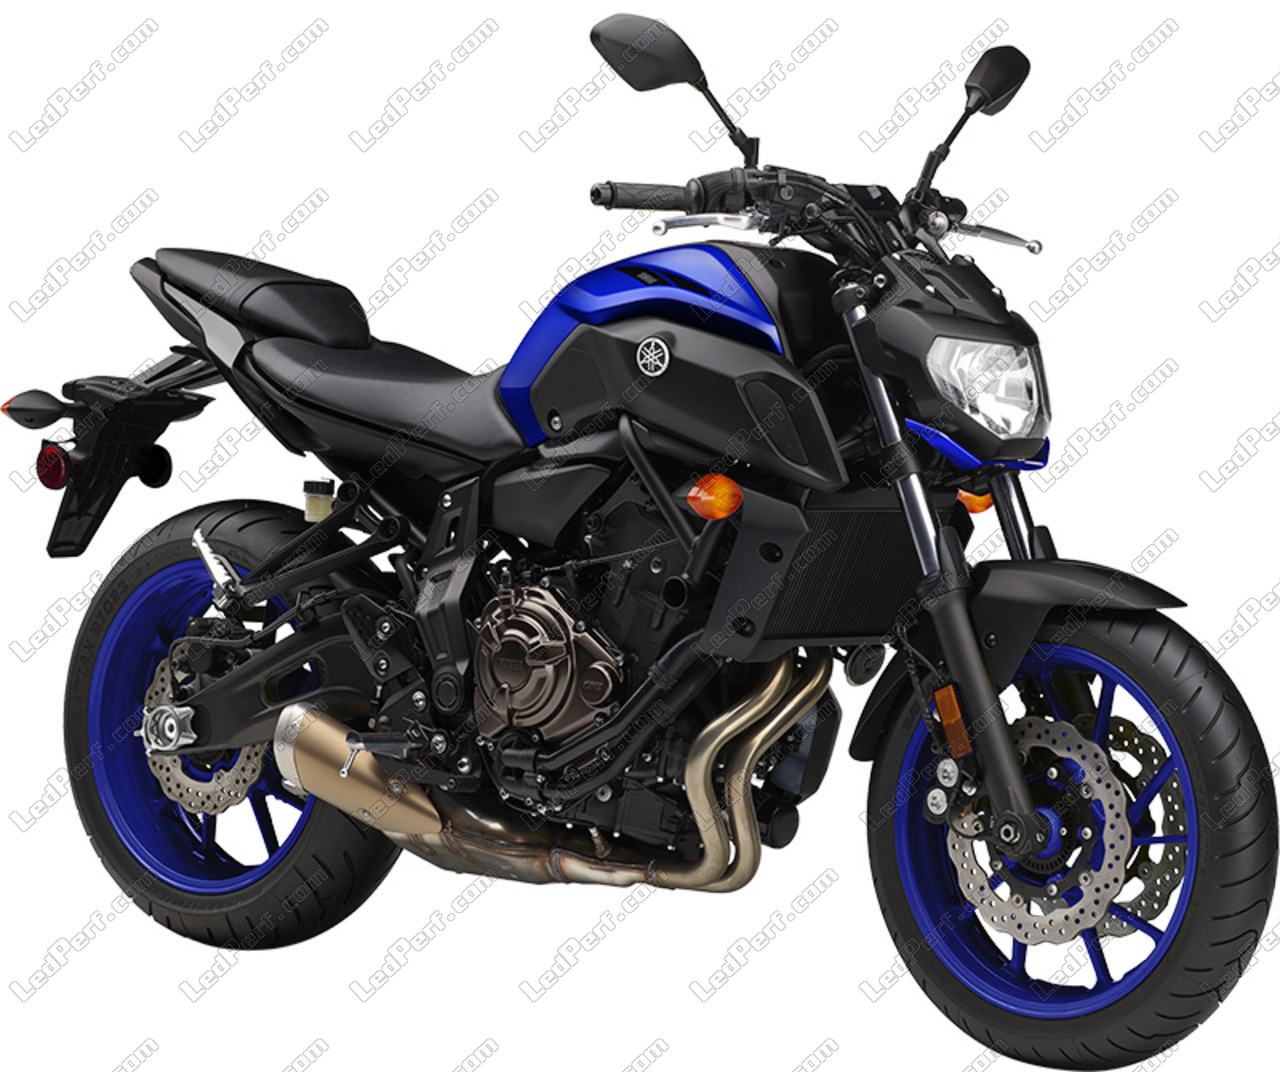 Additional Led Headlights For Motorcycle Yamaha Mt 07 2018 2019